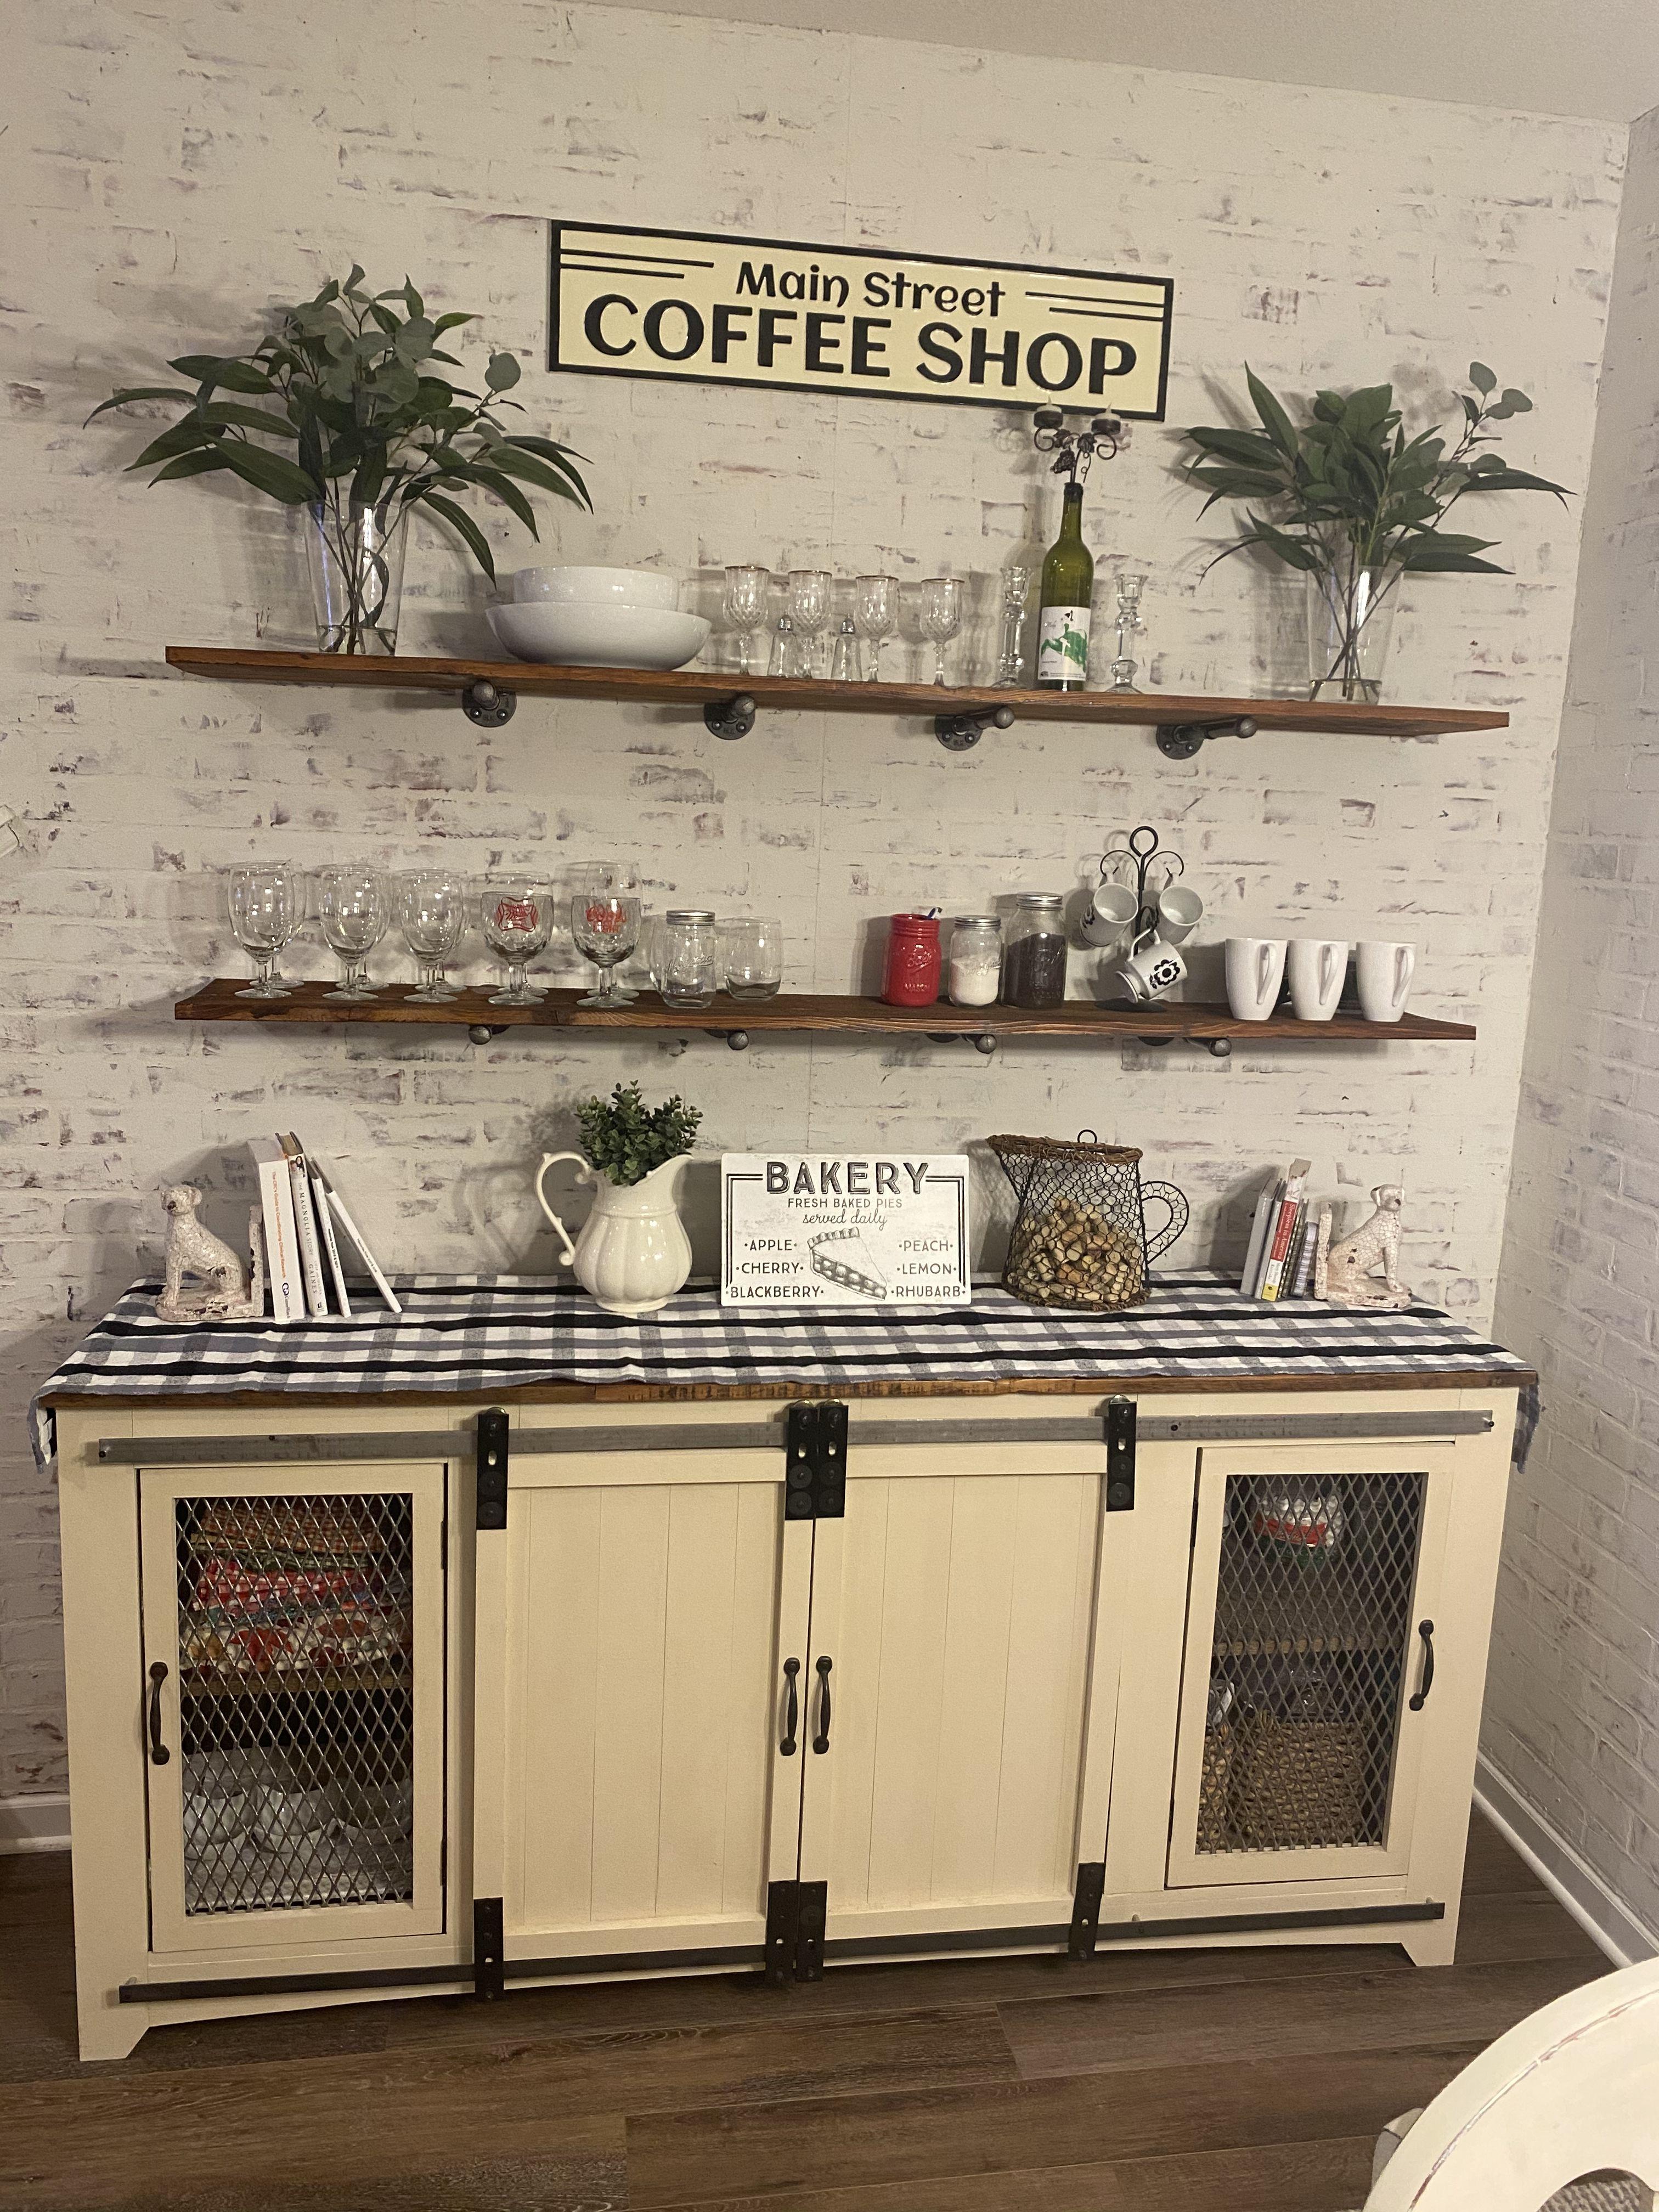 M I C H E L L E A On Instagram When Life Gives You Lemons Make Something Sweet Americanfar Kitchen Decor Cool Bars Rustic House